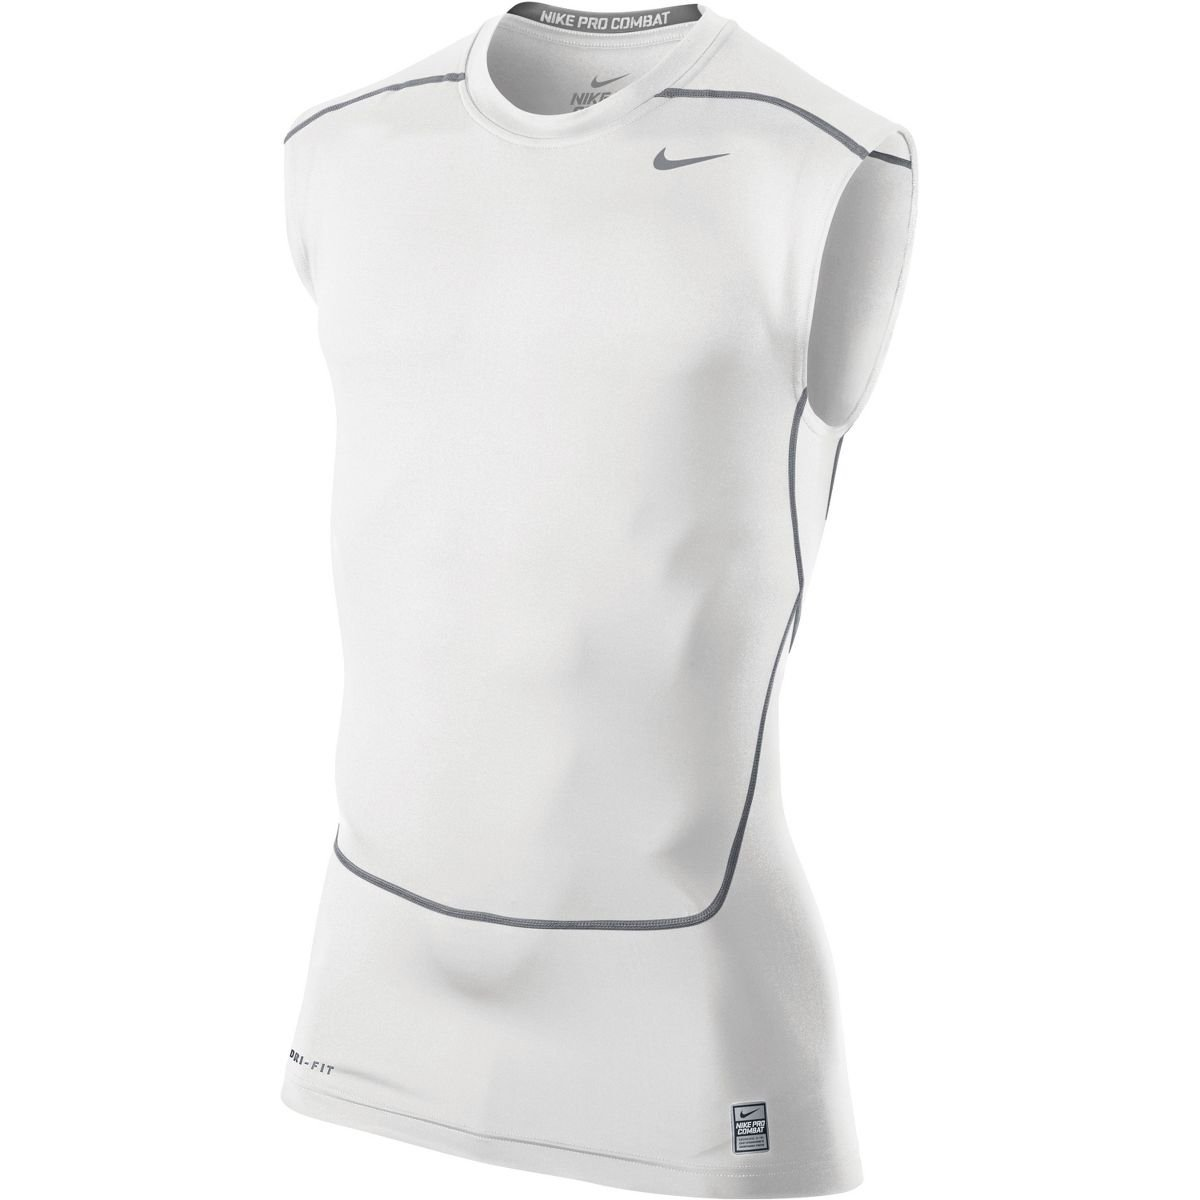 Nike Men's Pro Combat Core 2.0 Compression Sleeveless Top 533324,3XL, White